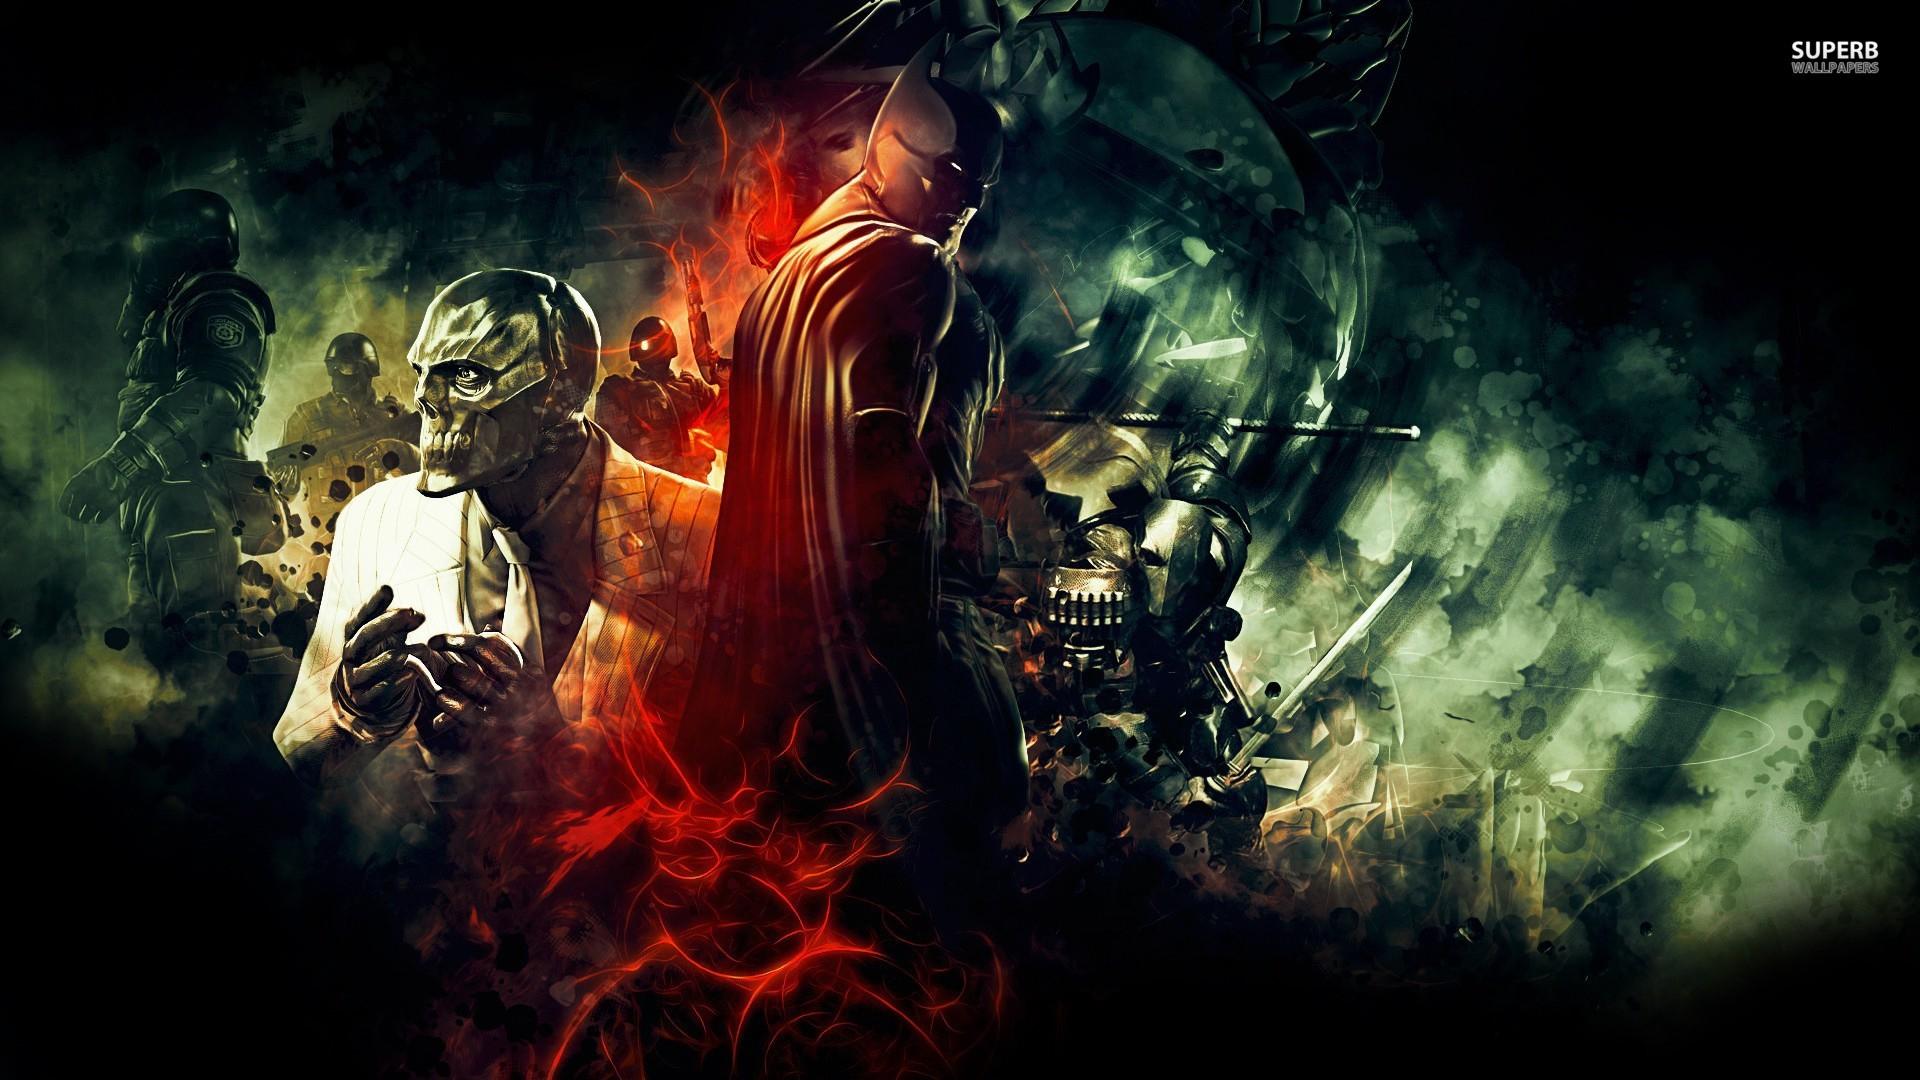 Deathstroke Batman Arkham Origins wallpaper Game wallpapers | HD Wallpapers  | Pinterest | Deathstroke and Wallpaper